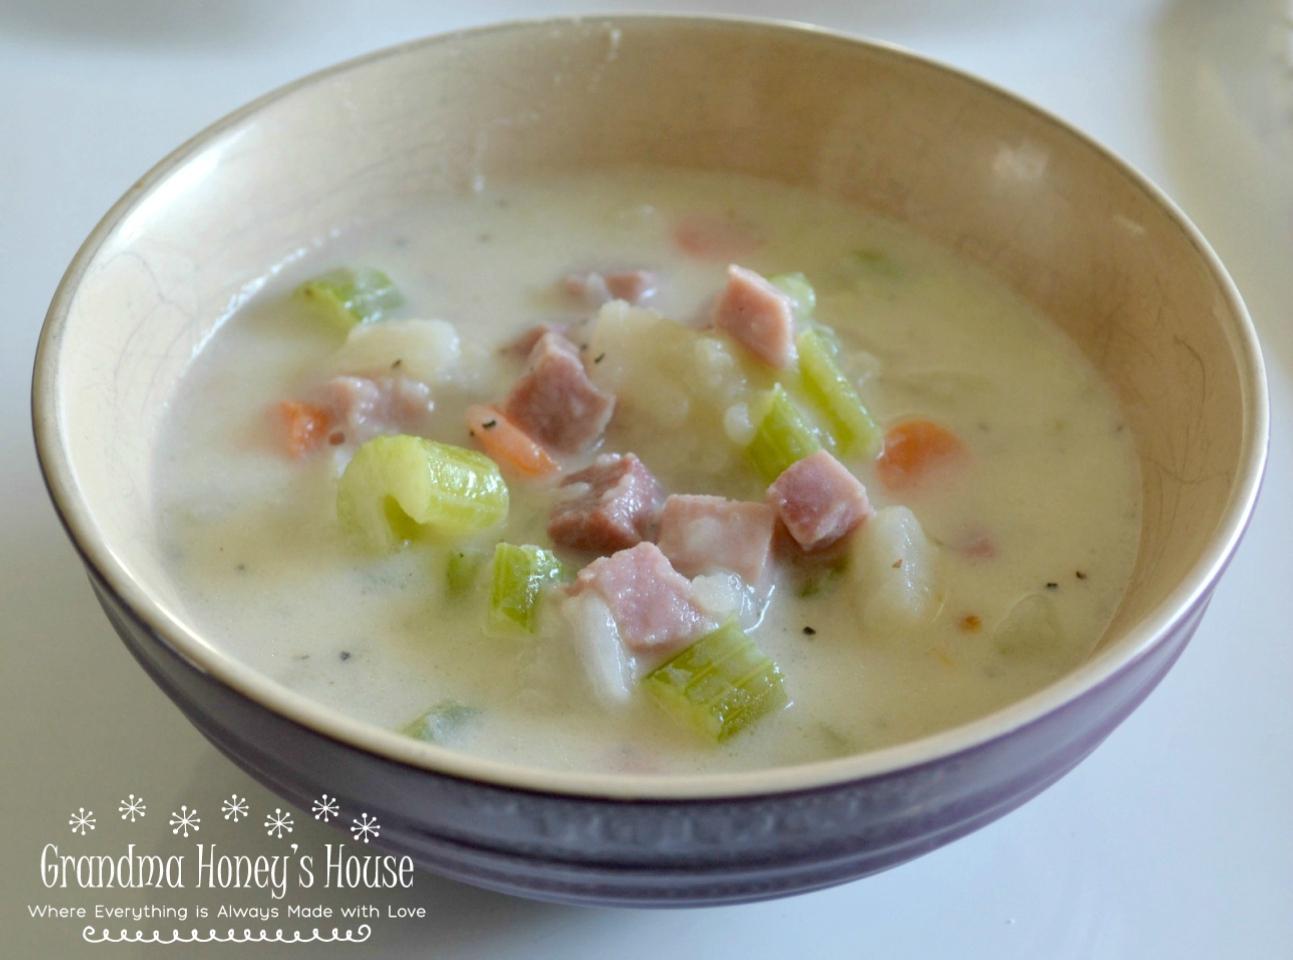 Potato soup recipes that are family favorites. Loaded baked potato or old fashioned potato & ham.